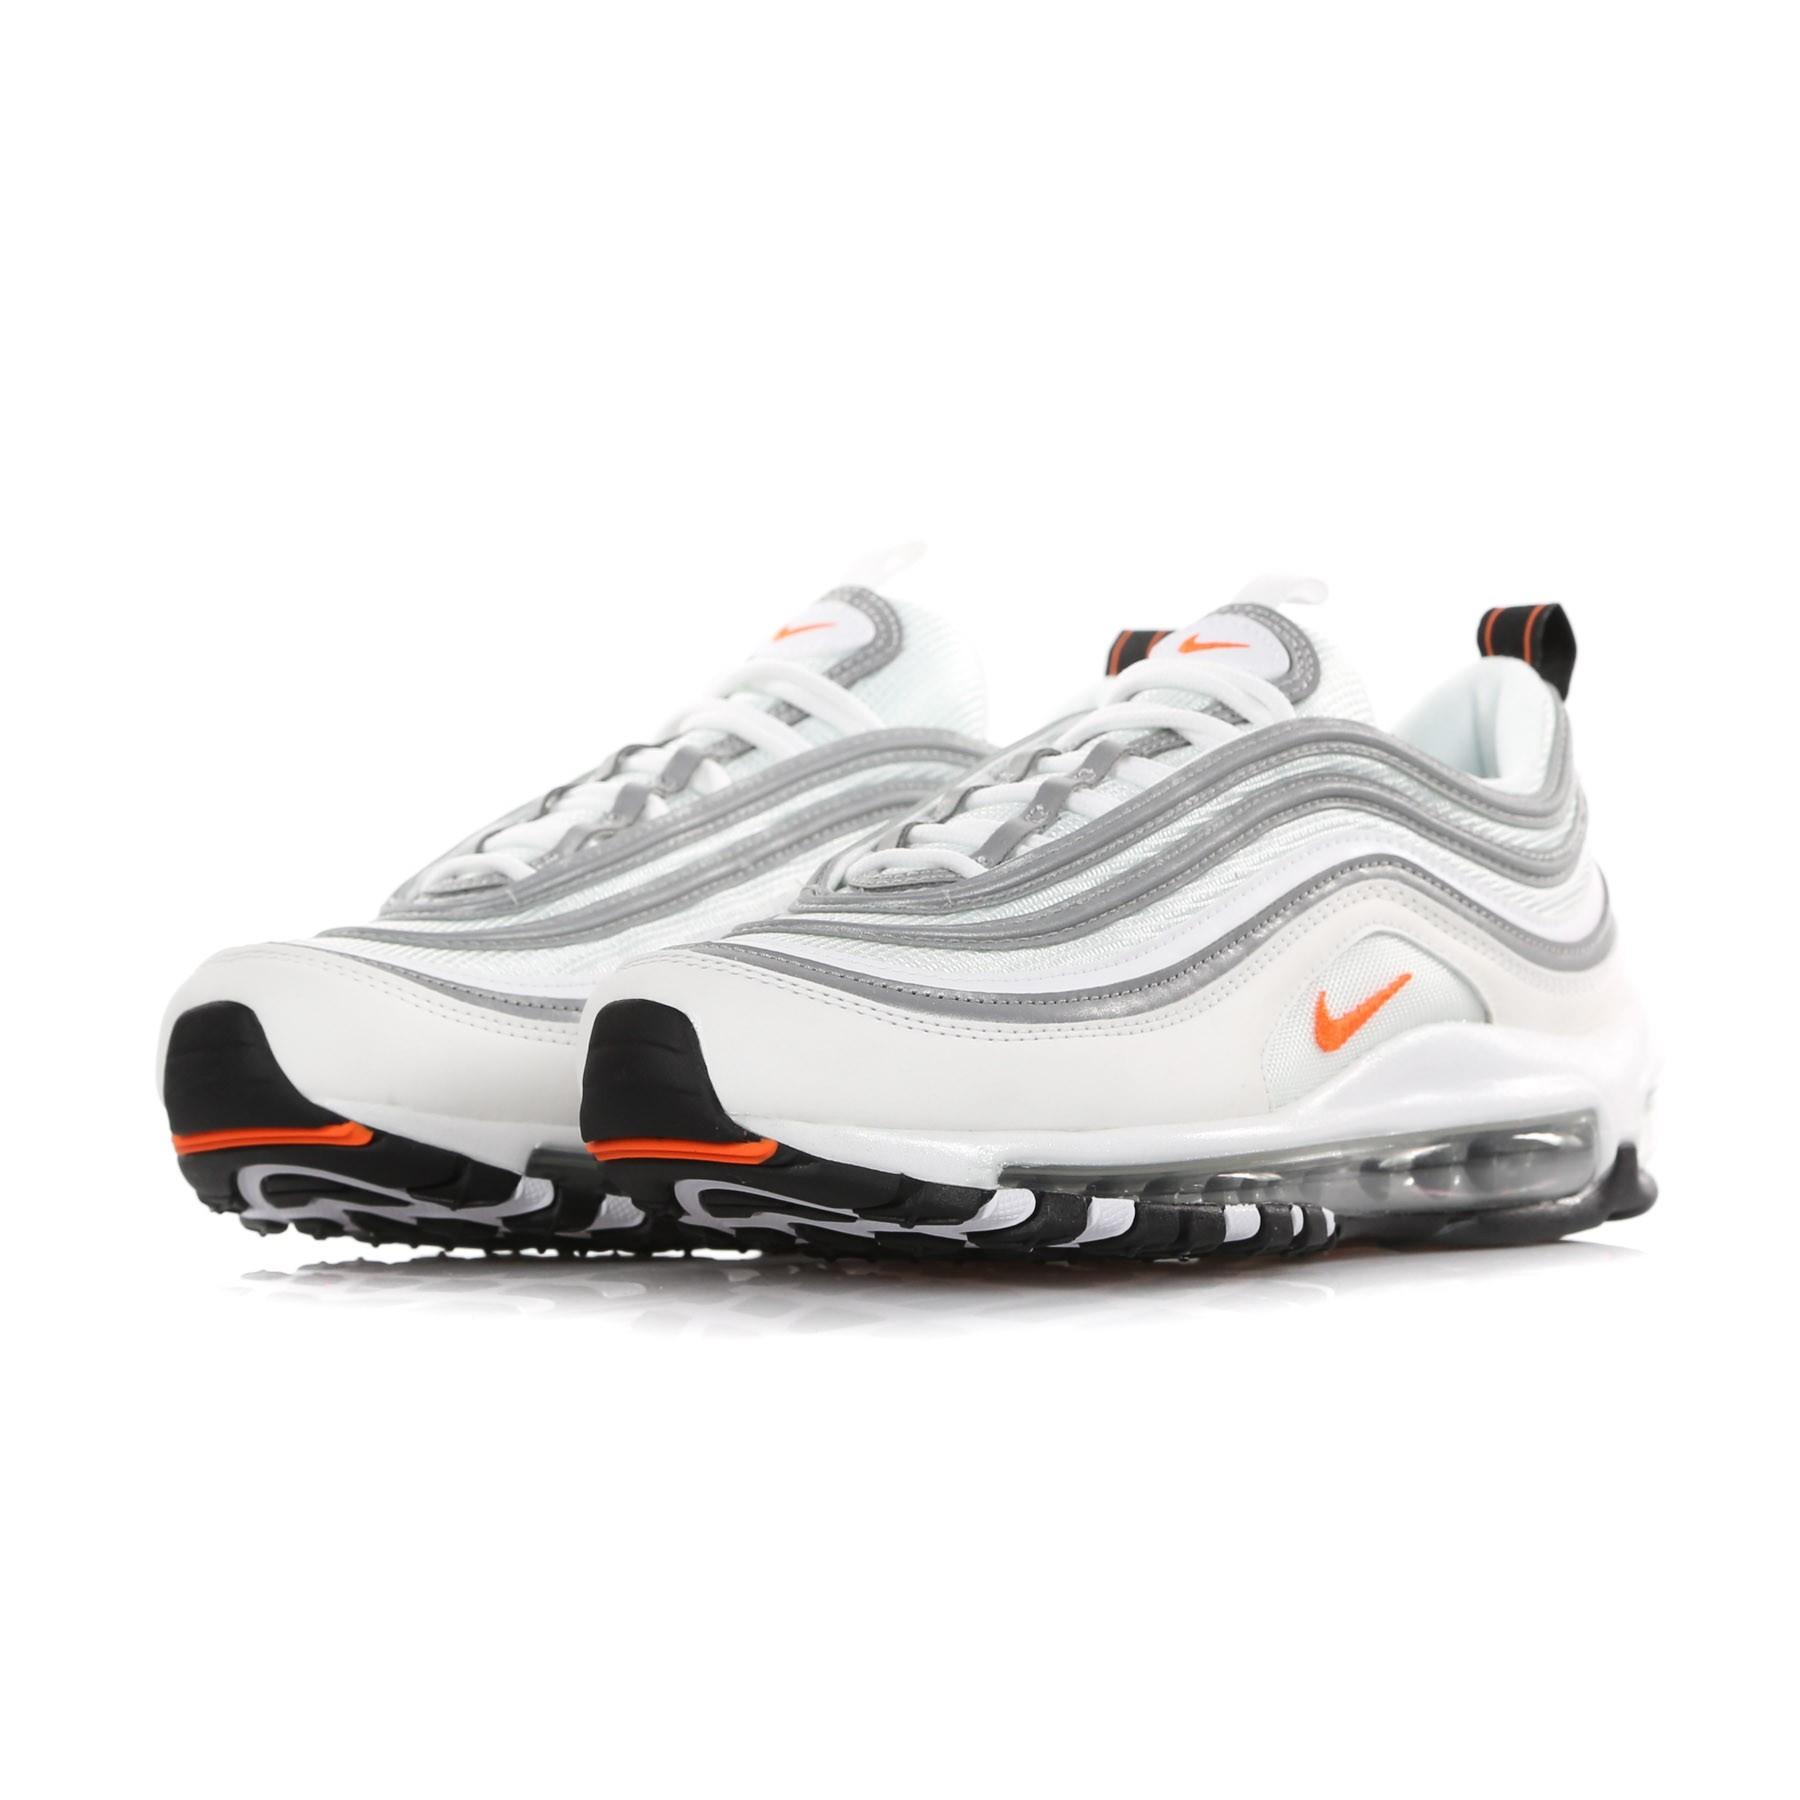 Nike Sportswear Shoes Air Max 97 WE WhiteCone